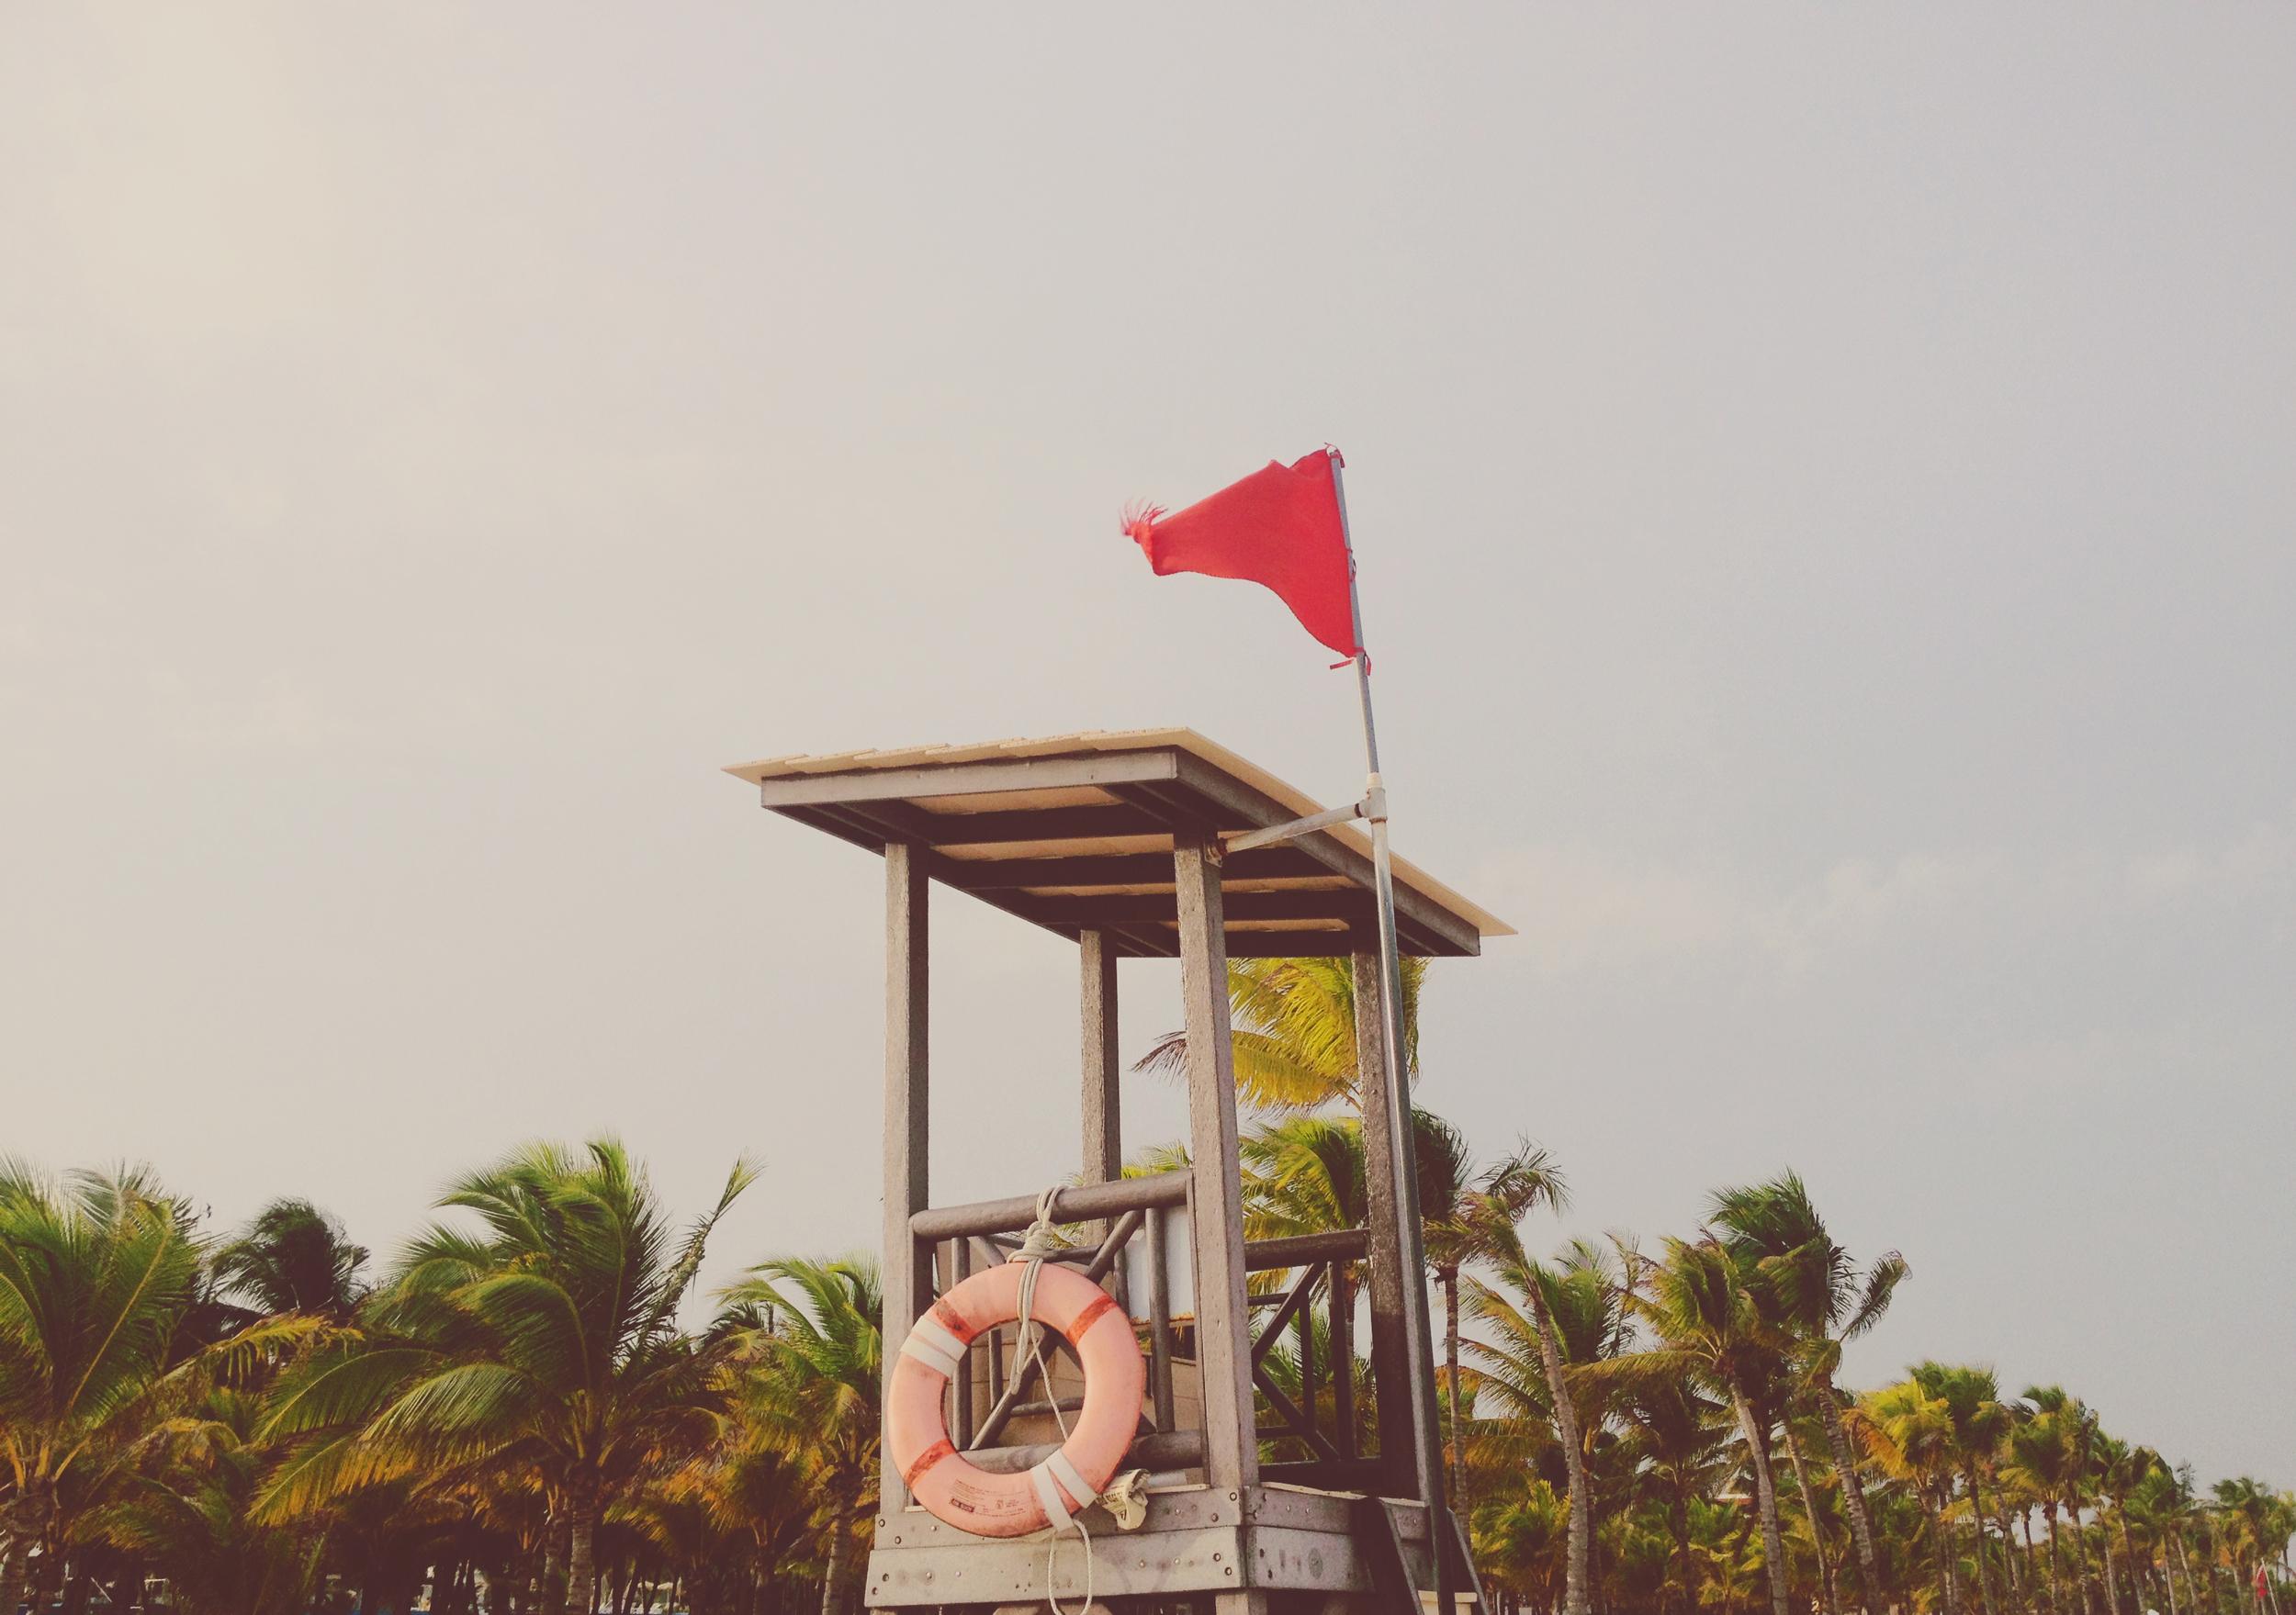 playa del carmen mexico, travel photography, jennifer picard photography